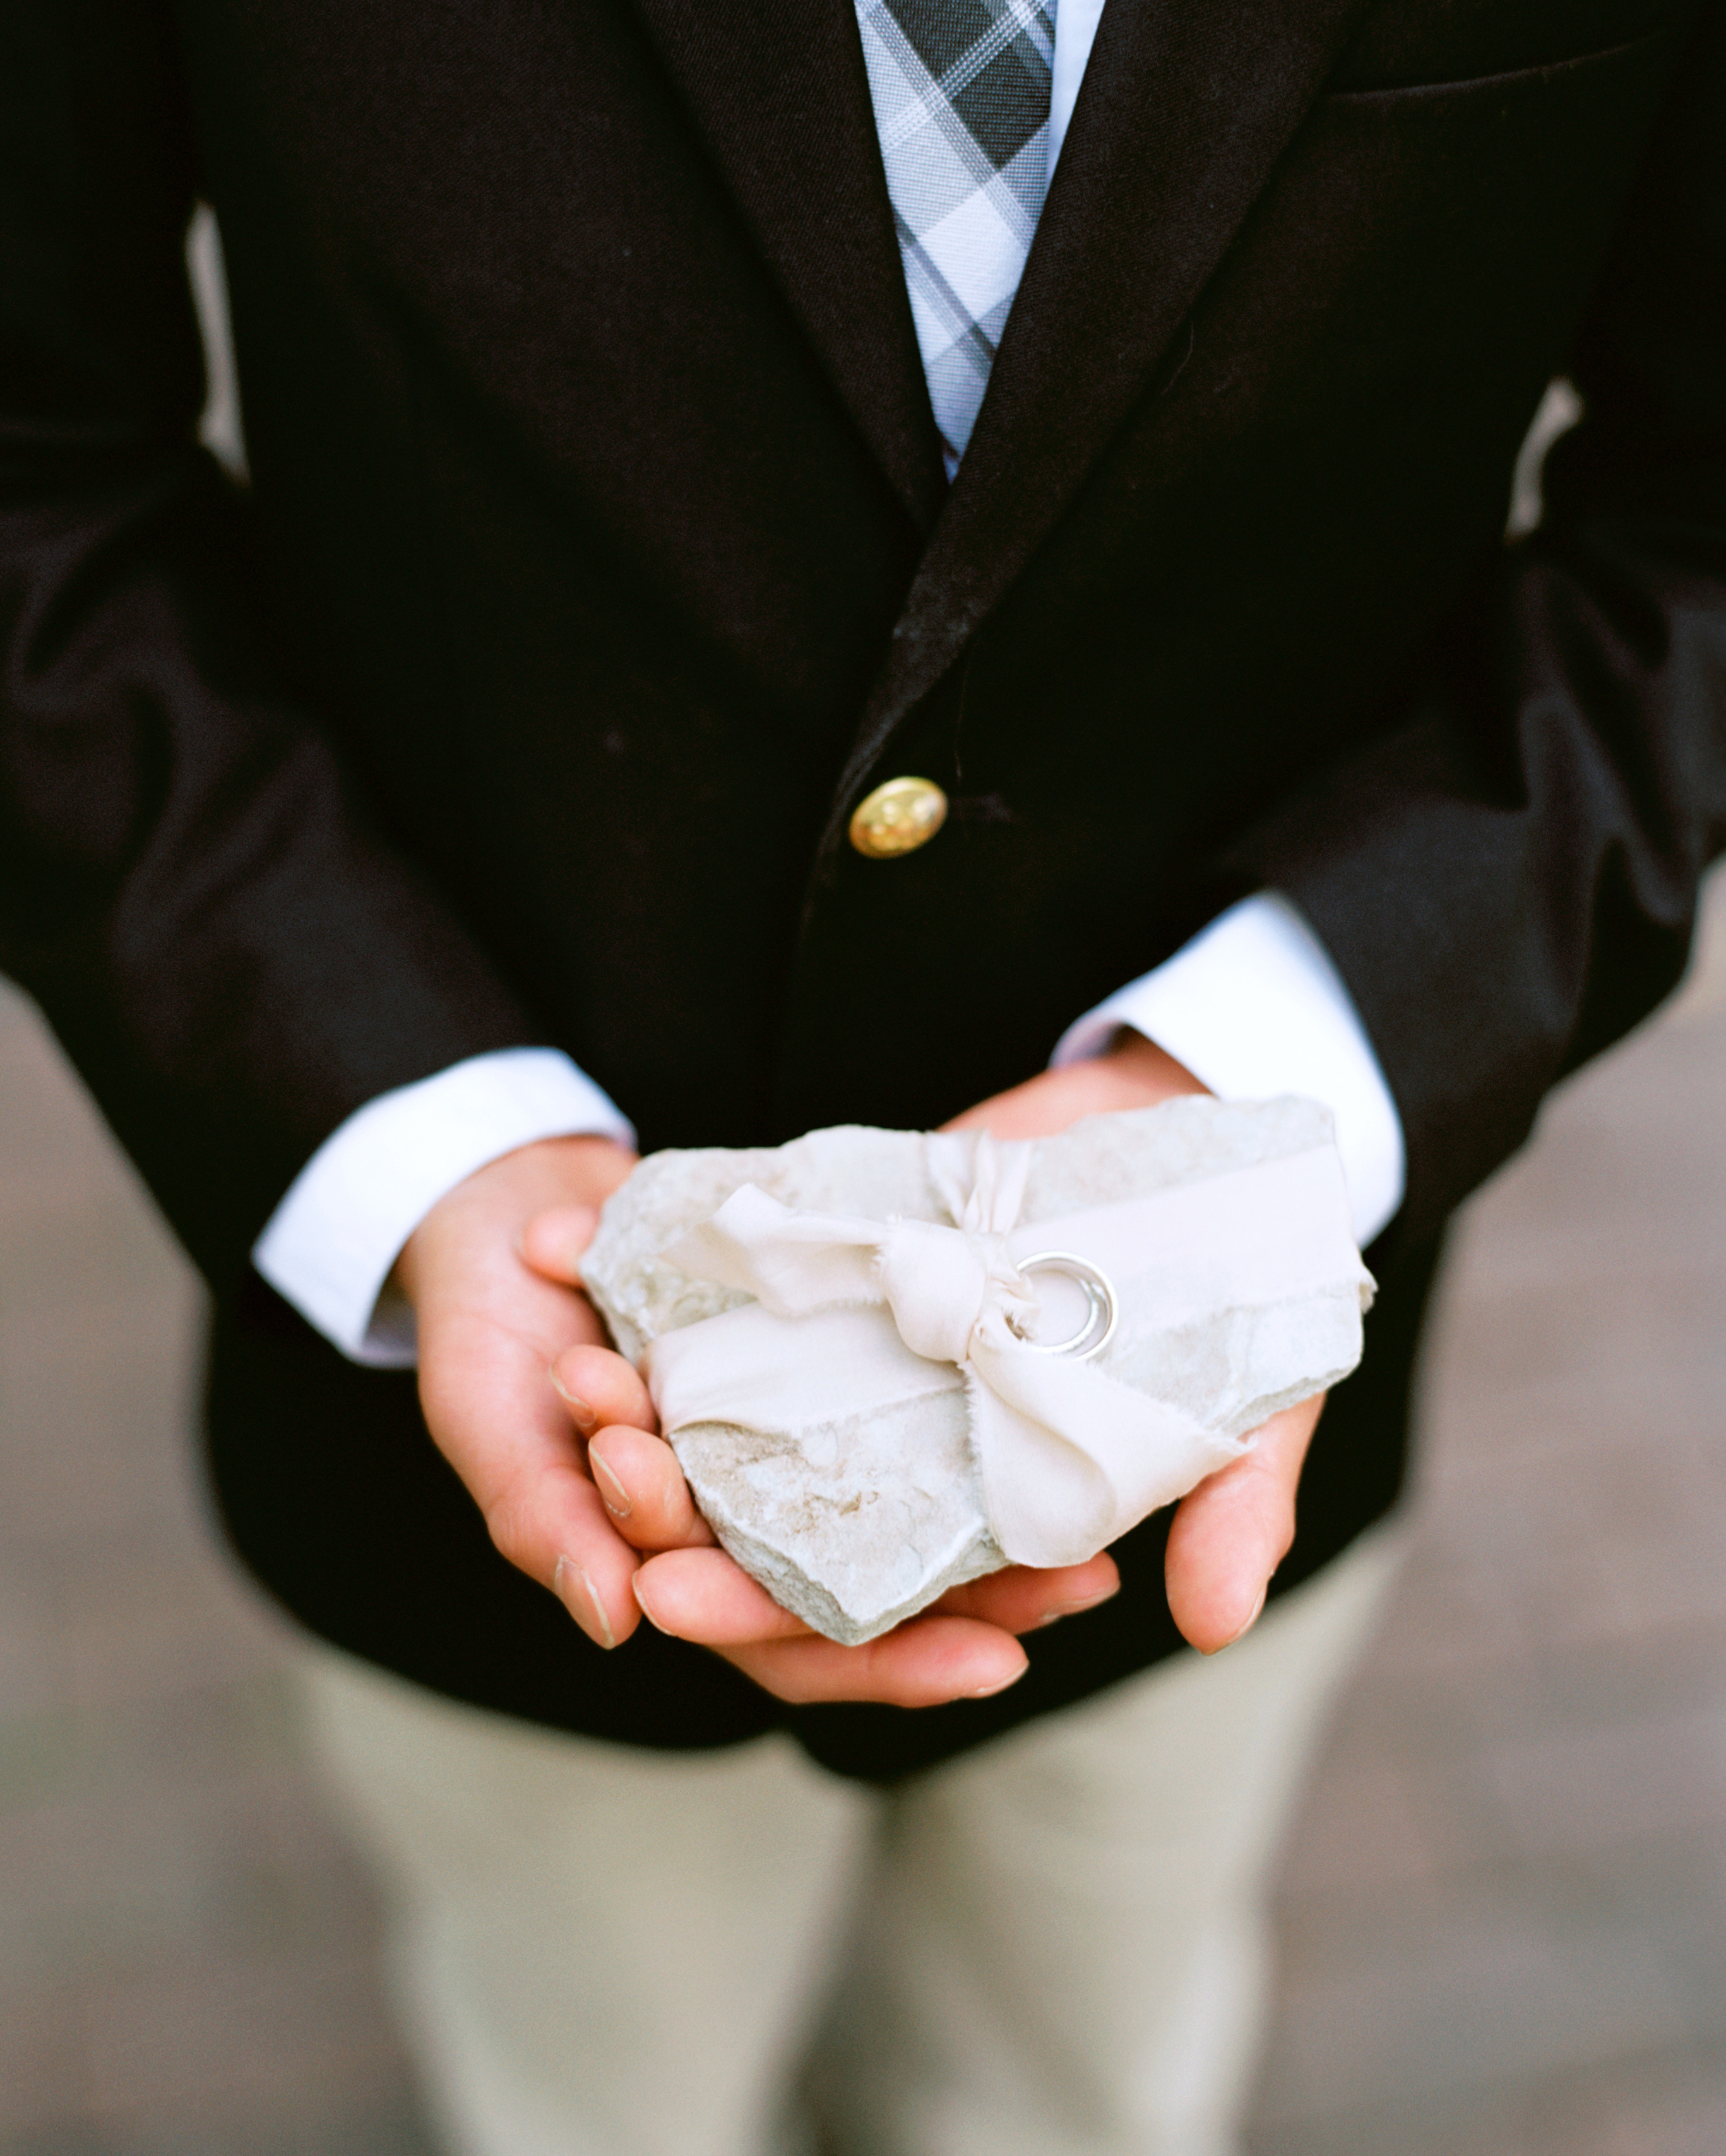 ally-adam-wedding-ringpillow-056-s111818-0215.jpg